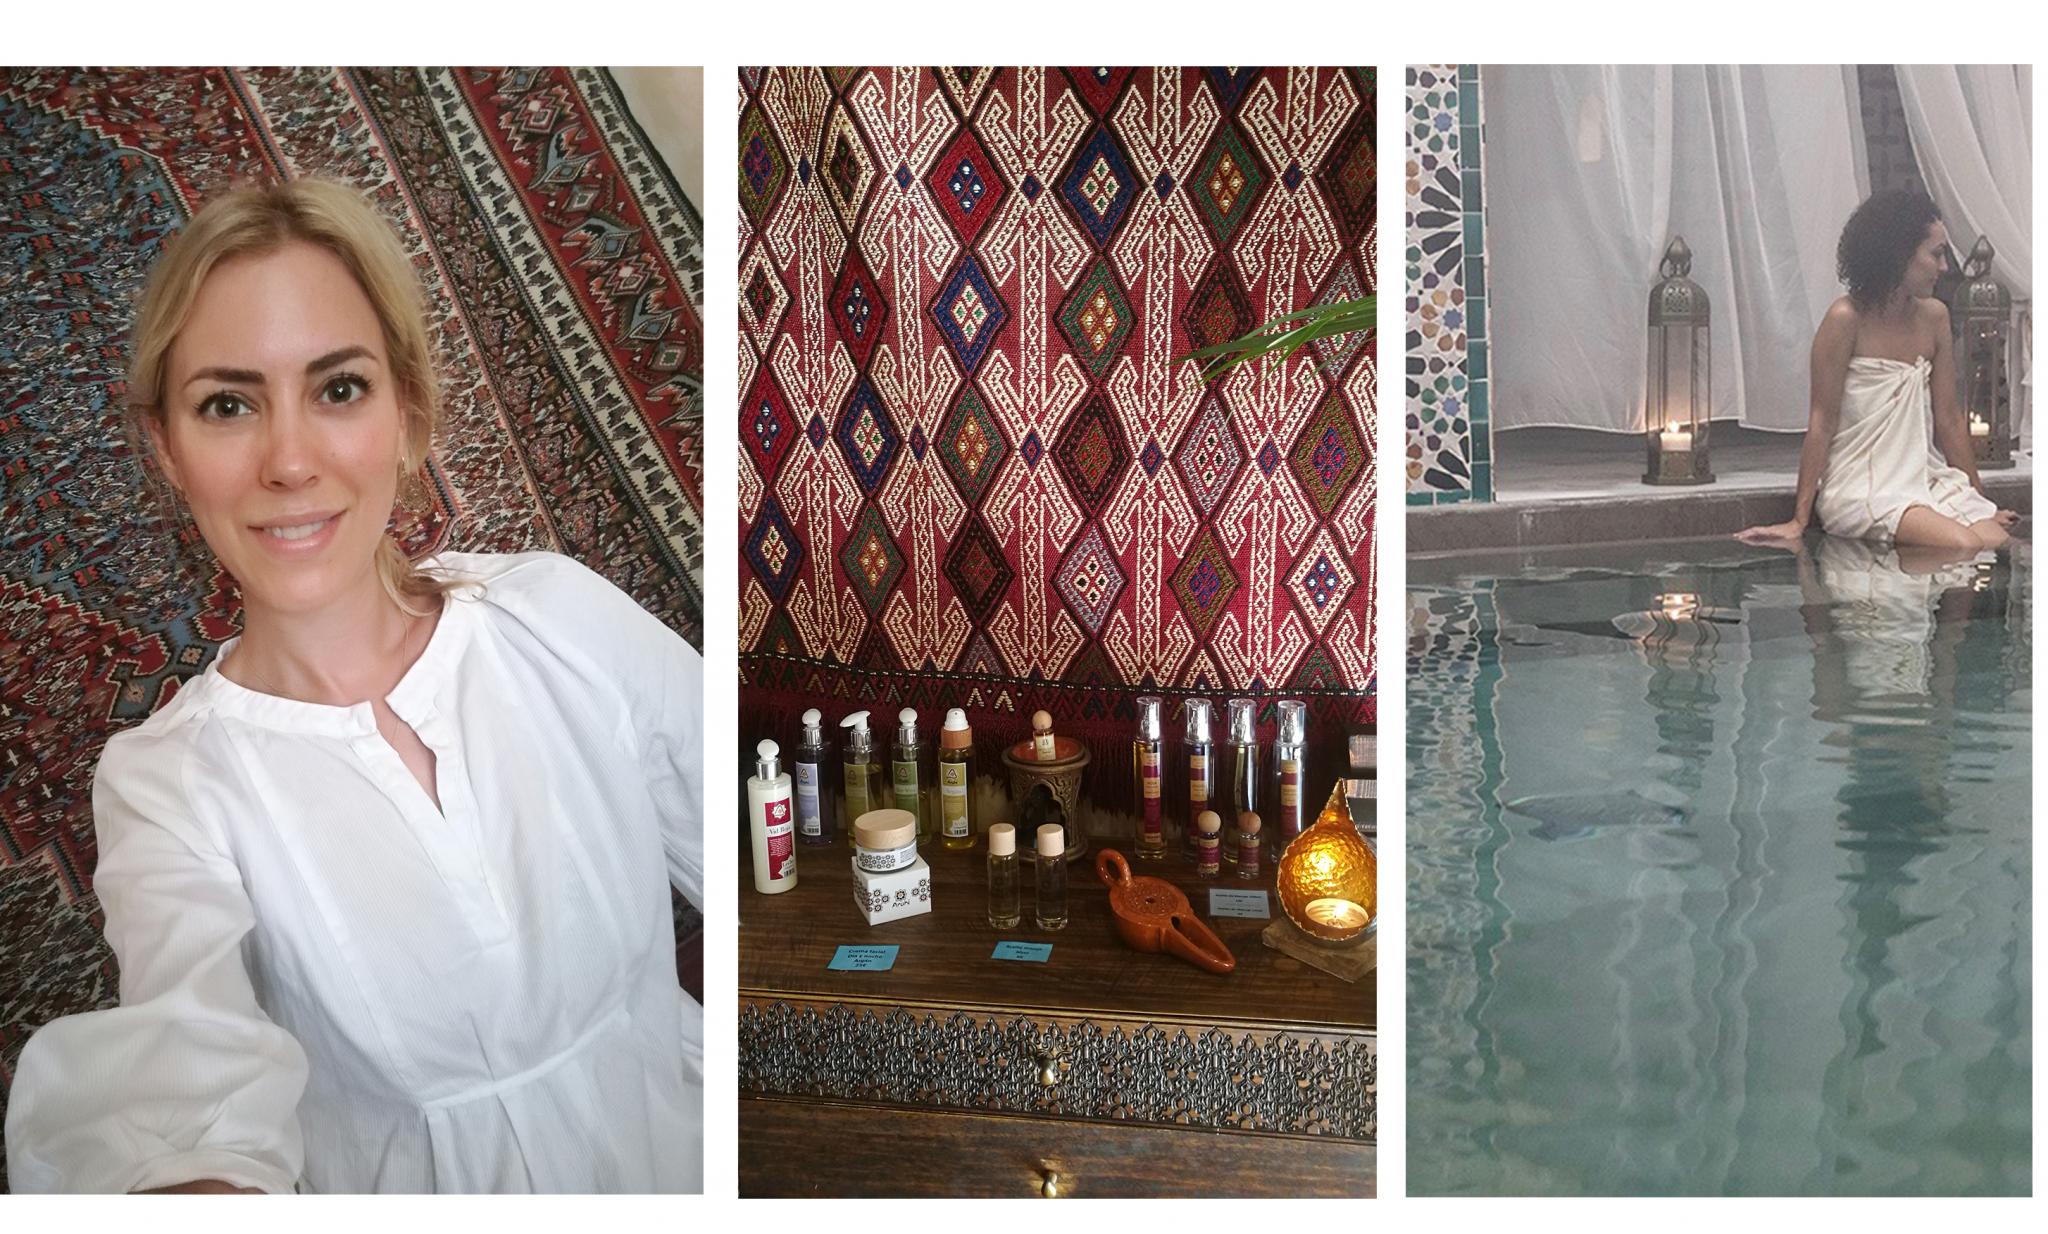 badhuis hammam ritueel